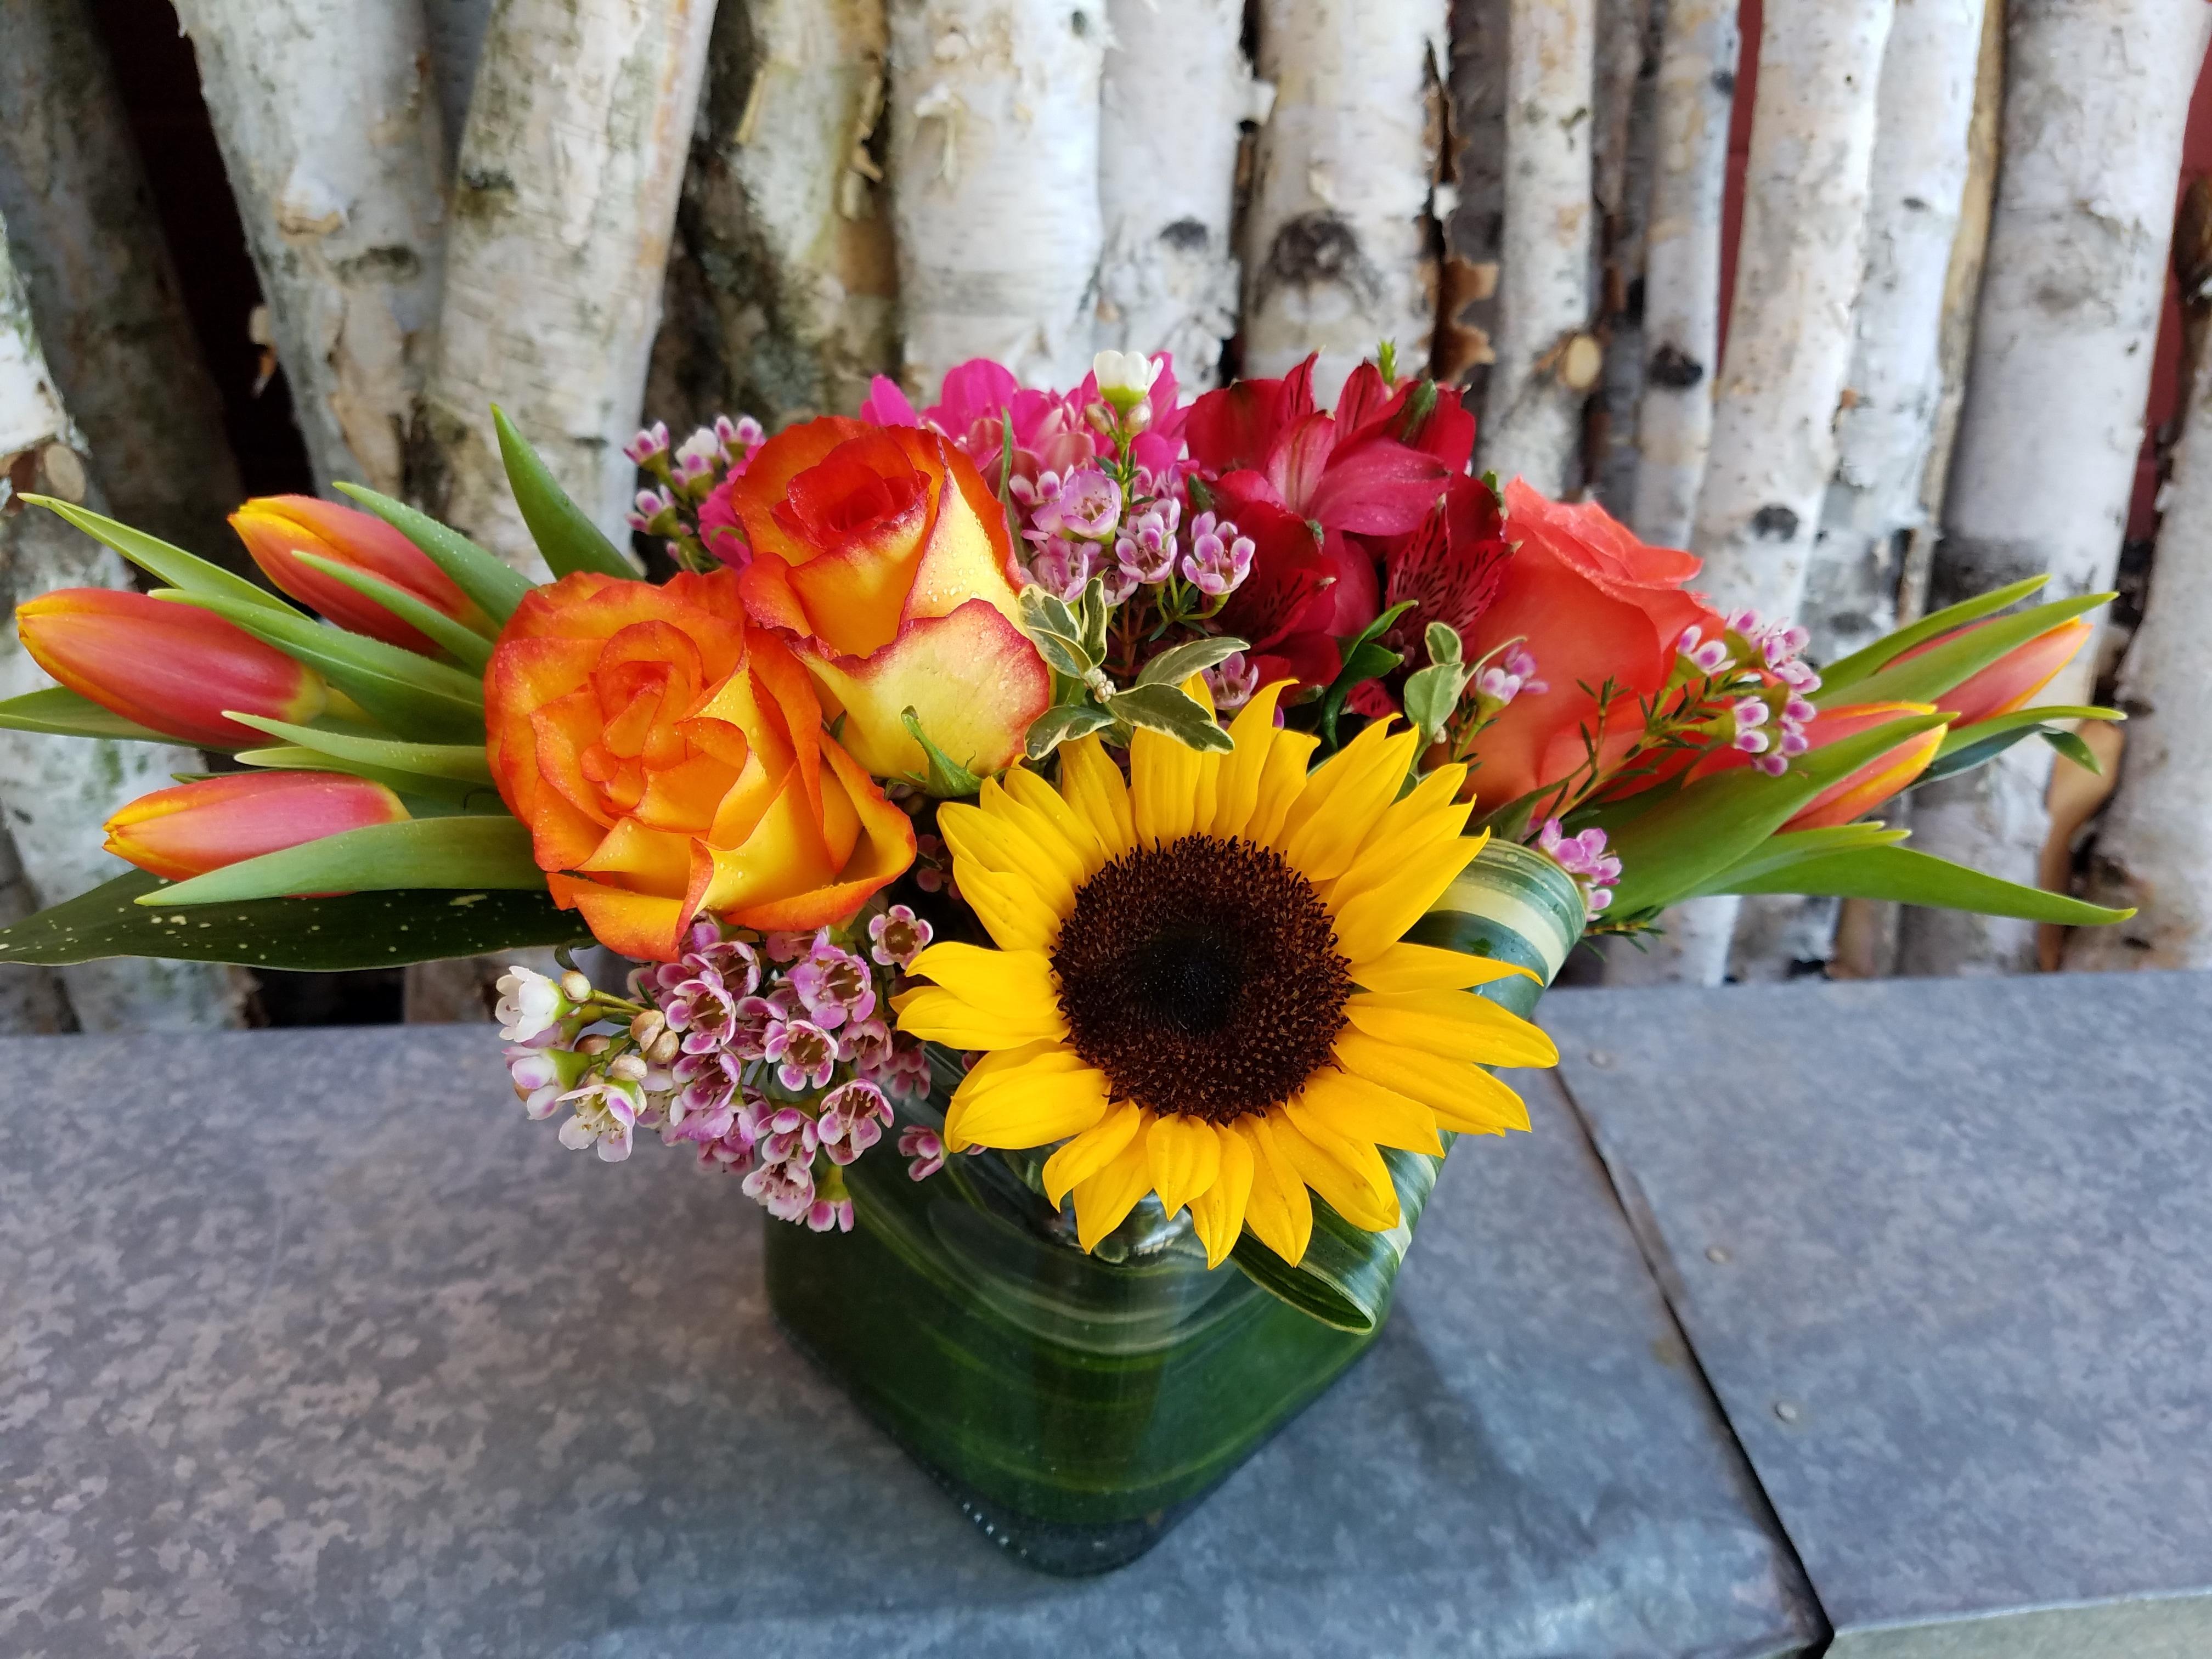 About blumz jrdesigns ferndale mi florist contact information izmirmasajfo